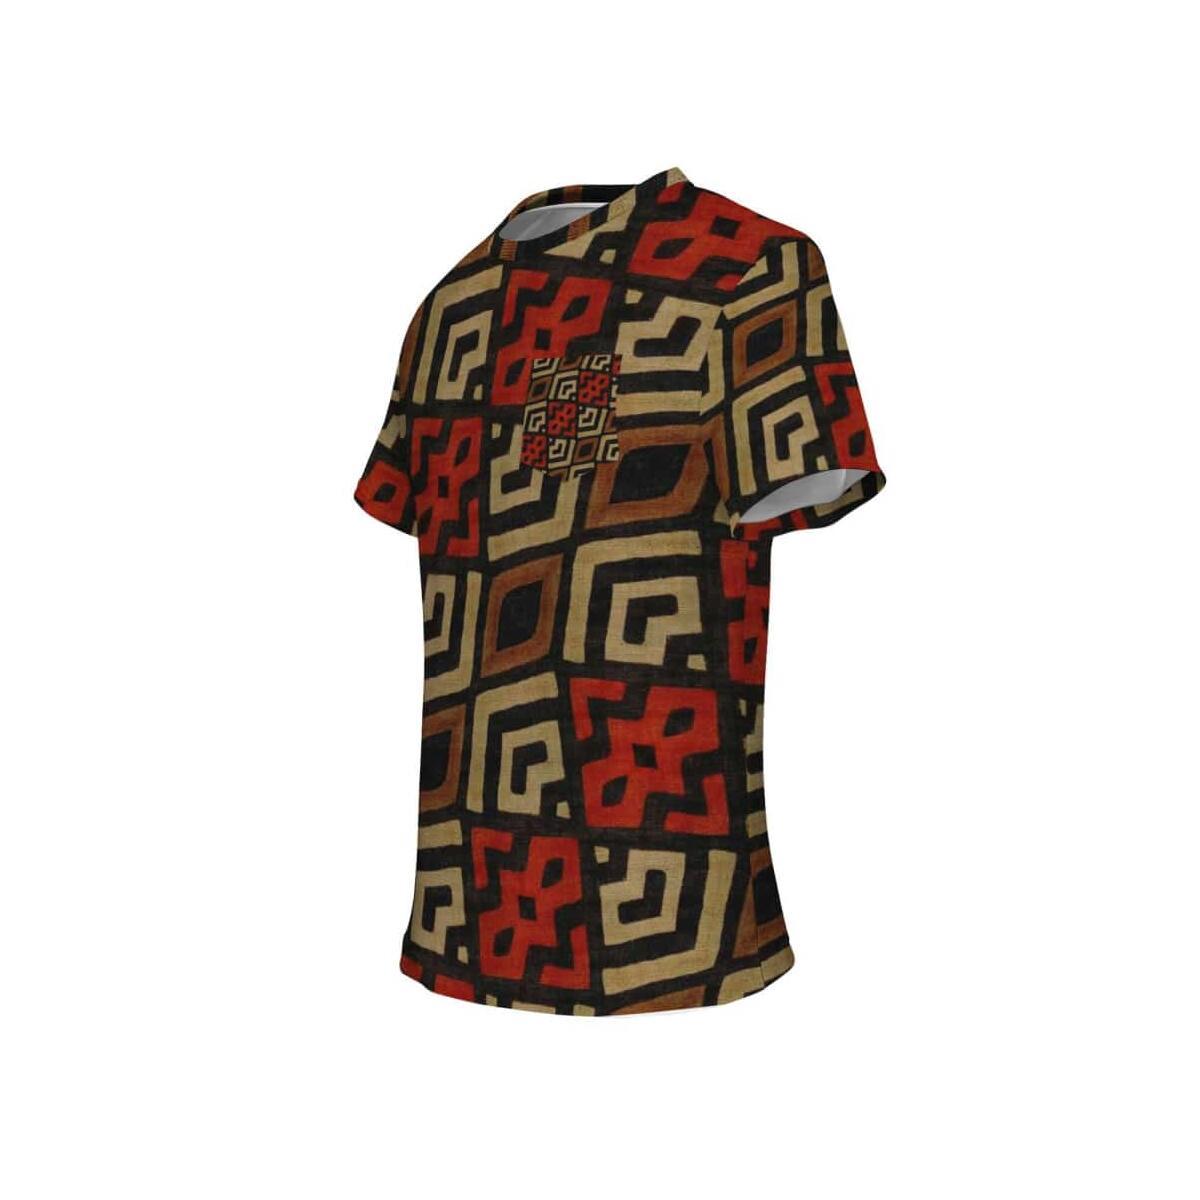 Bogolan Mystic Red Pocket T-shirt, S